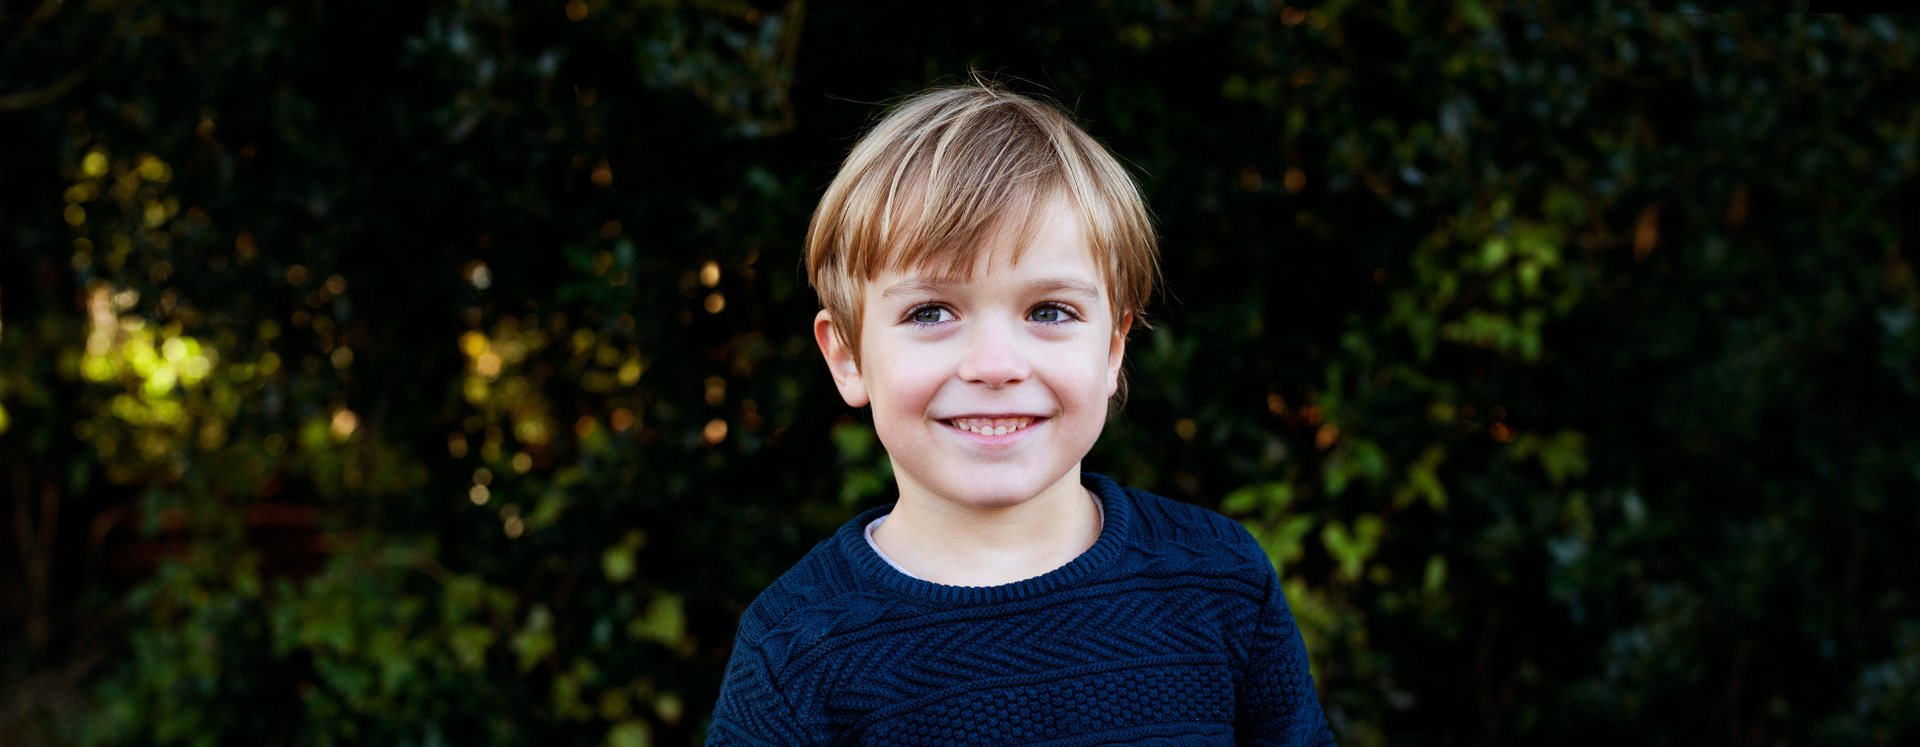 Voldsudsat dreng i park smiler